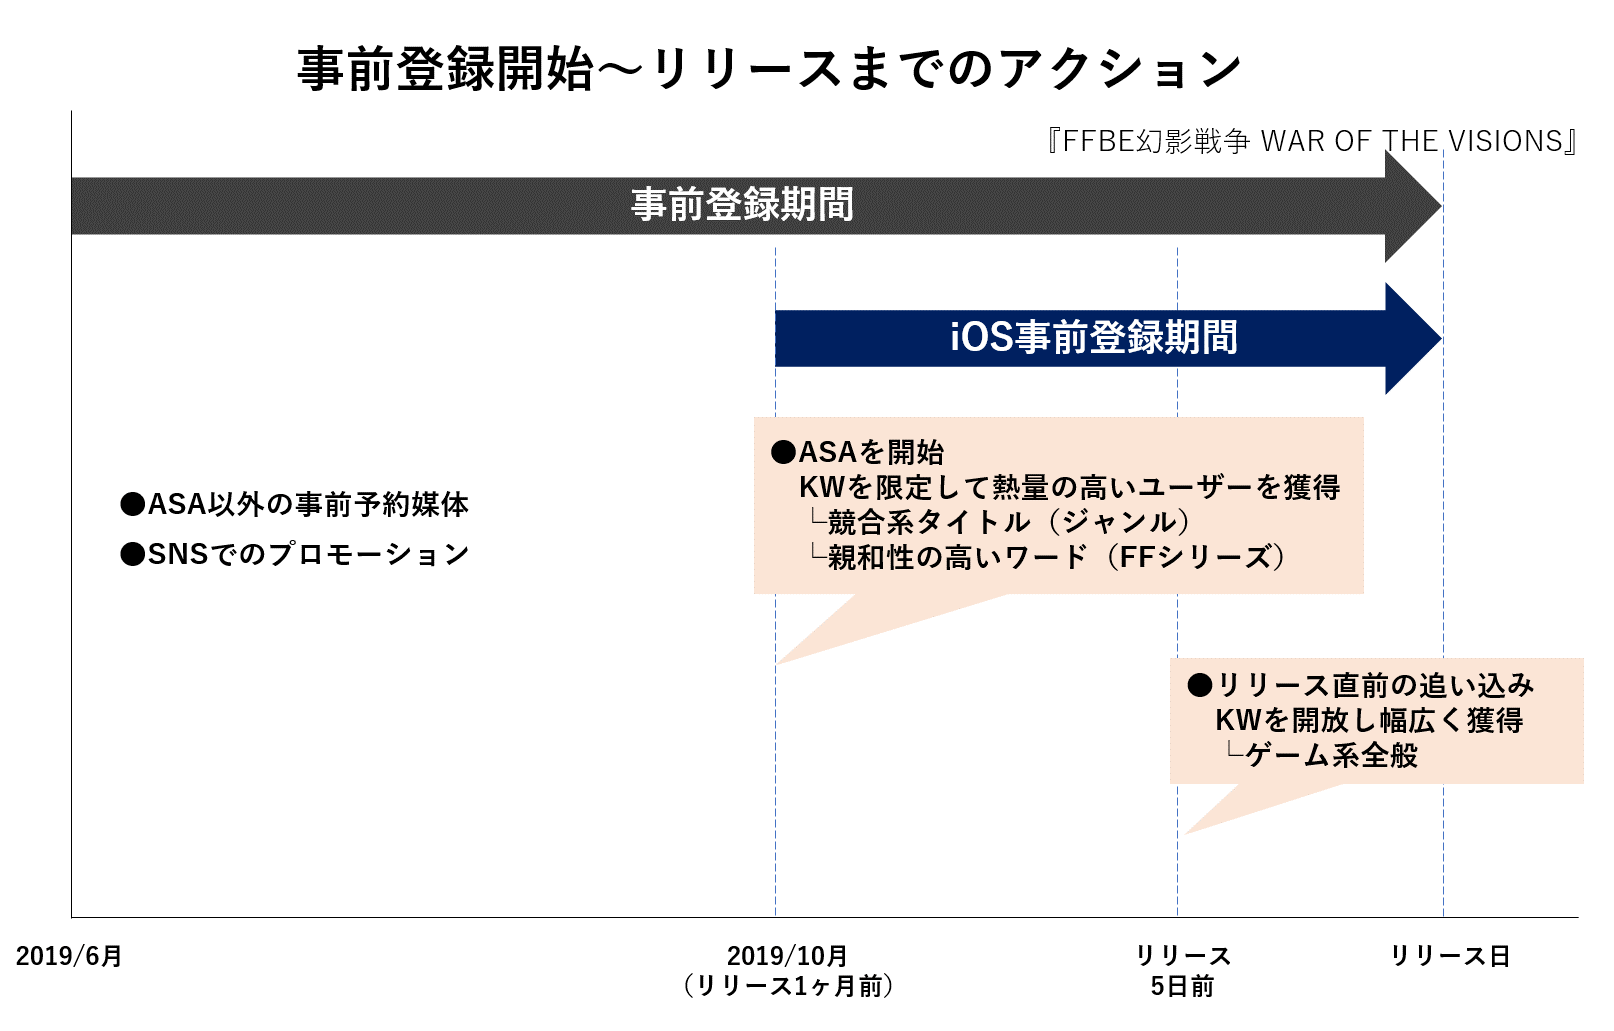 data_ffbe_seca_appbrain